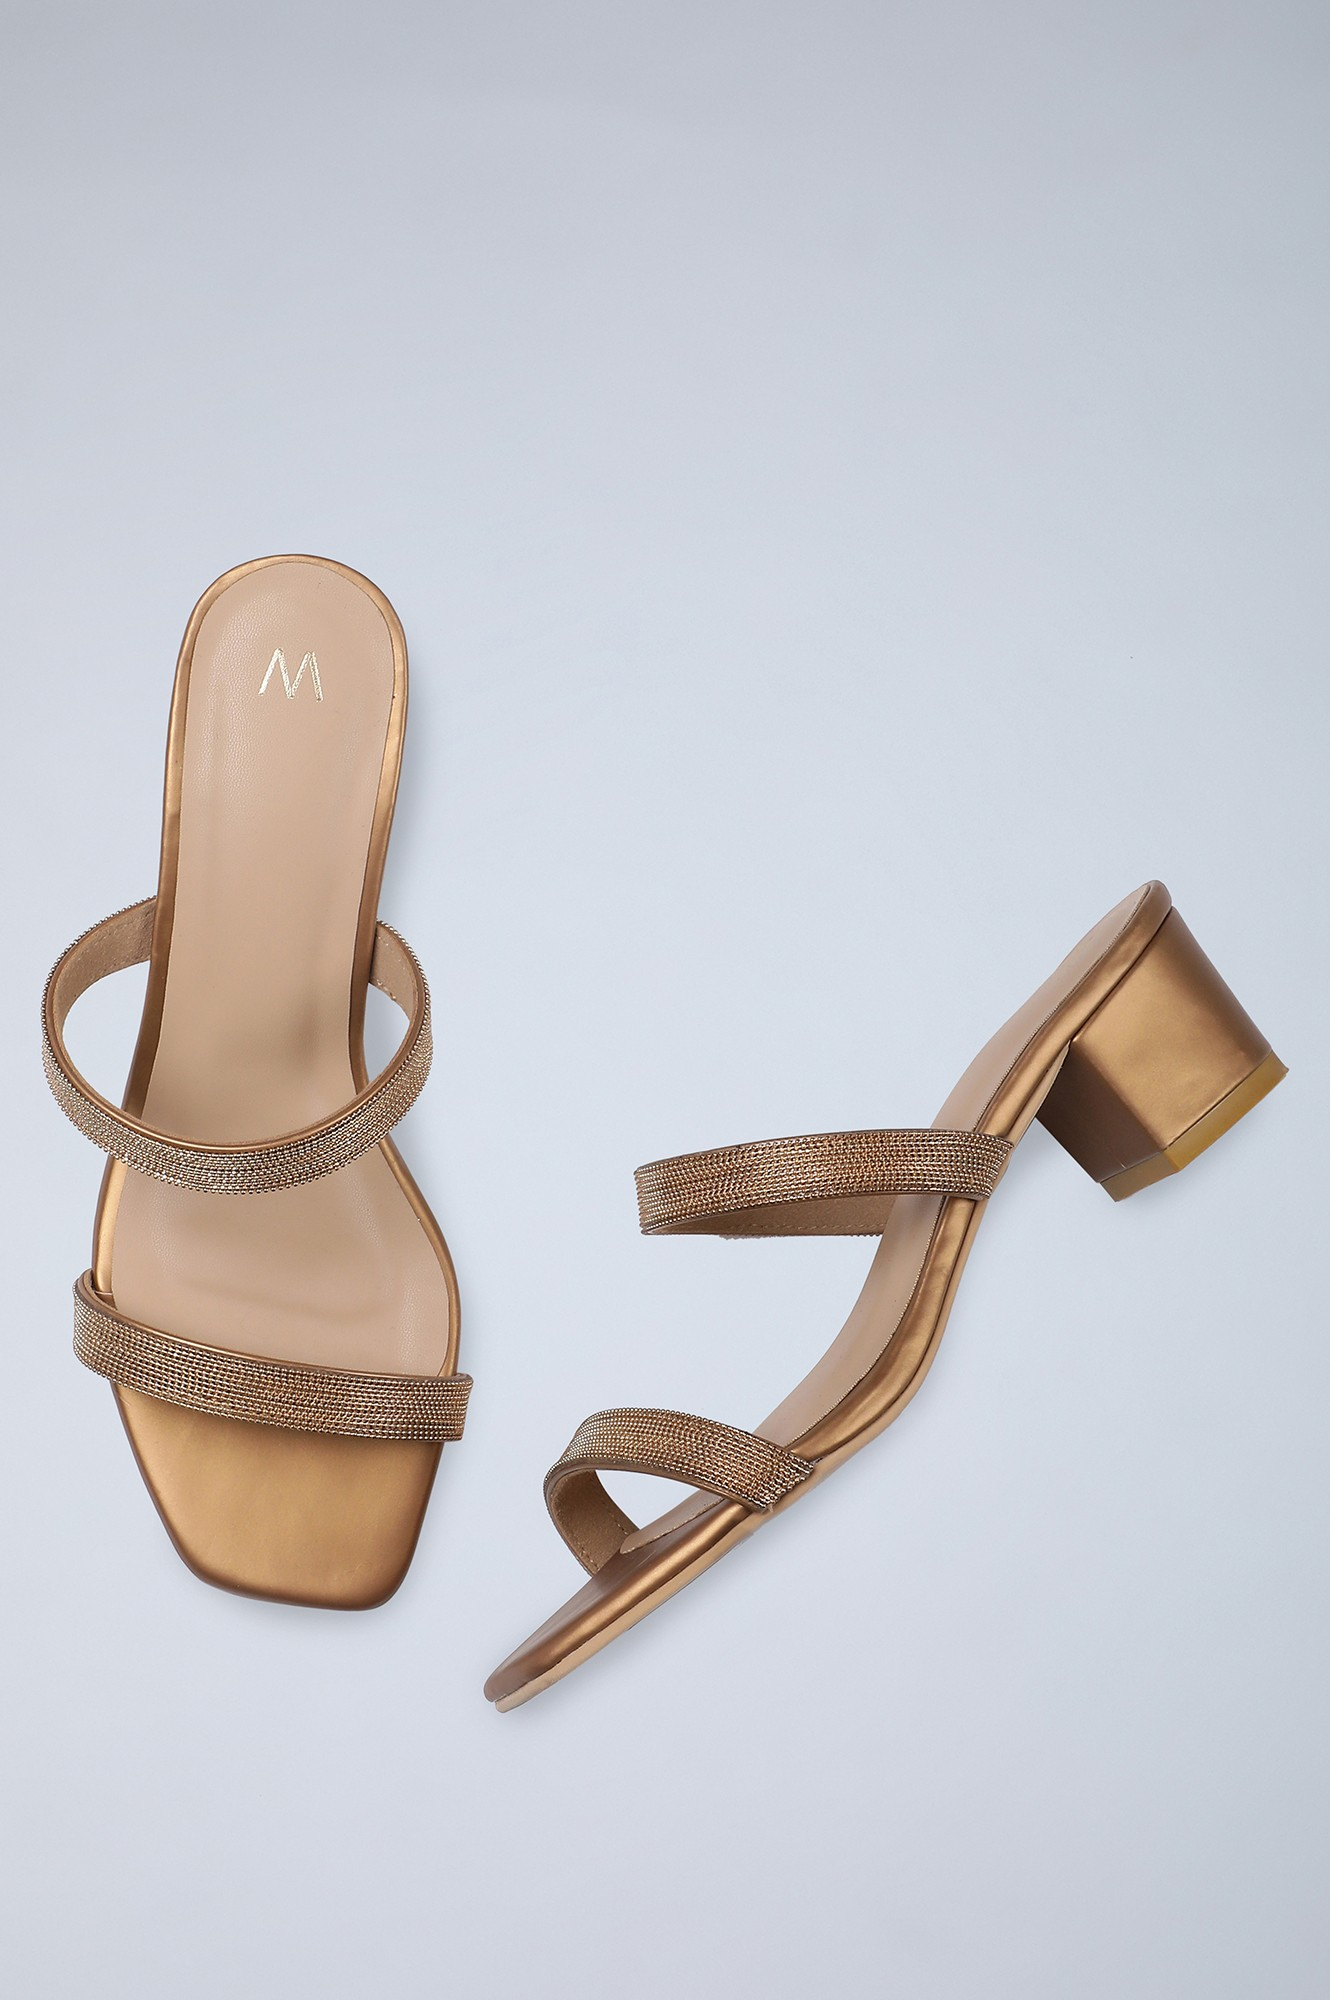 W | Square Toe Embellished Block Heel